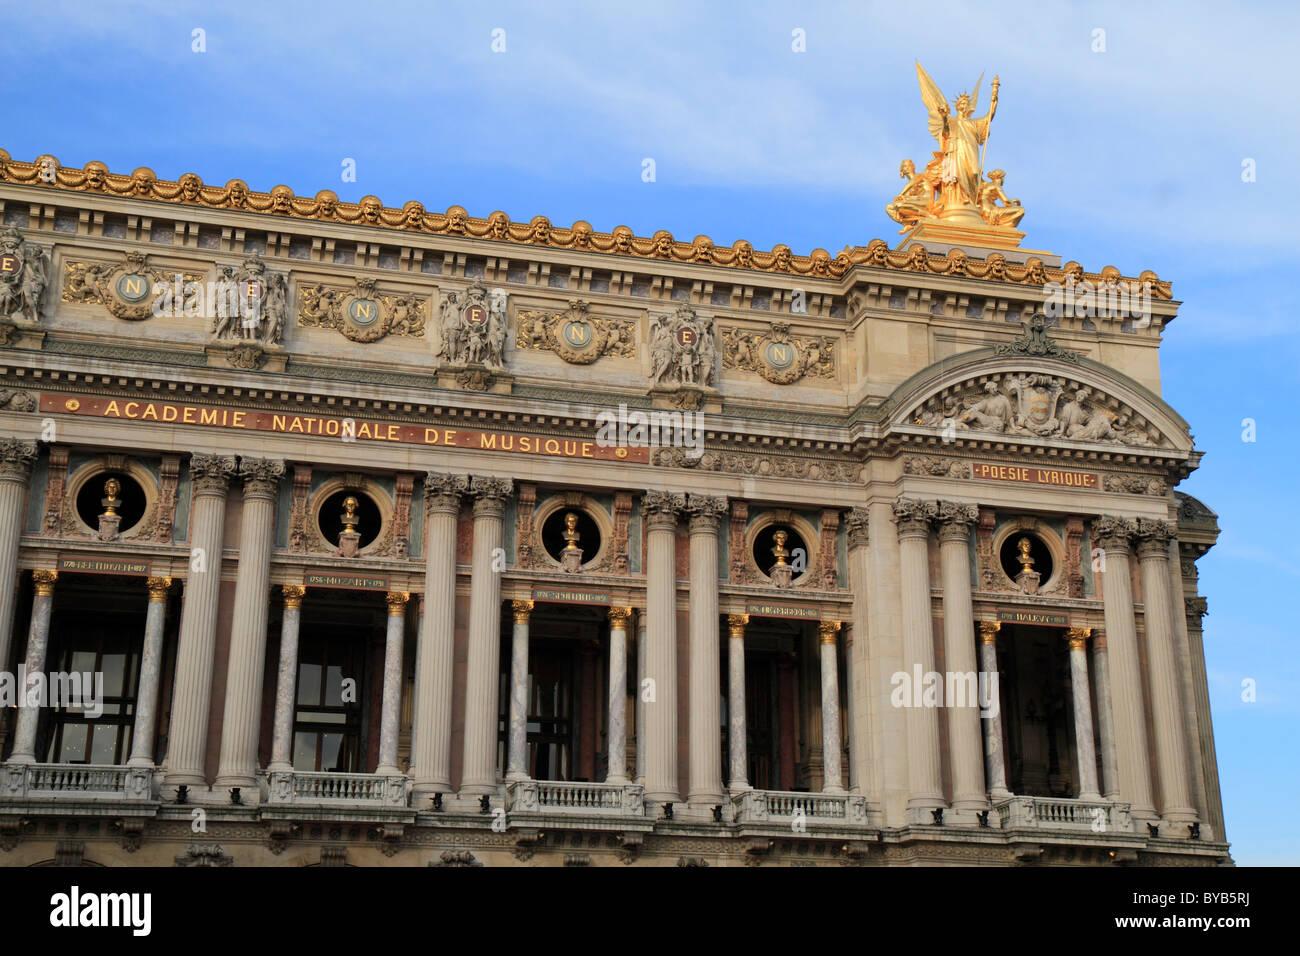 Main facade, Opéra de Paris, Palais Garnier, 9th Arrondissement, Paris, France, Europe - Stock Image